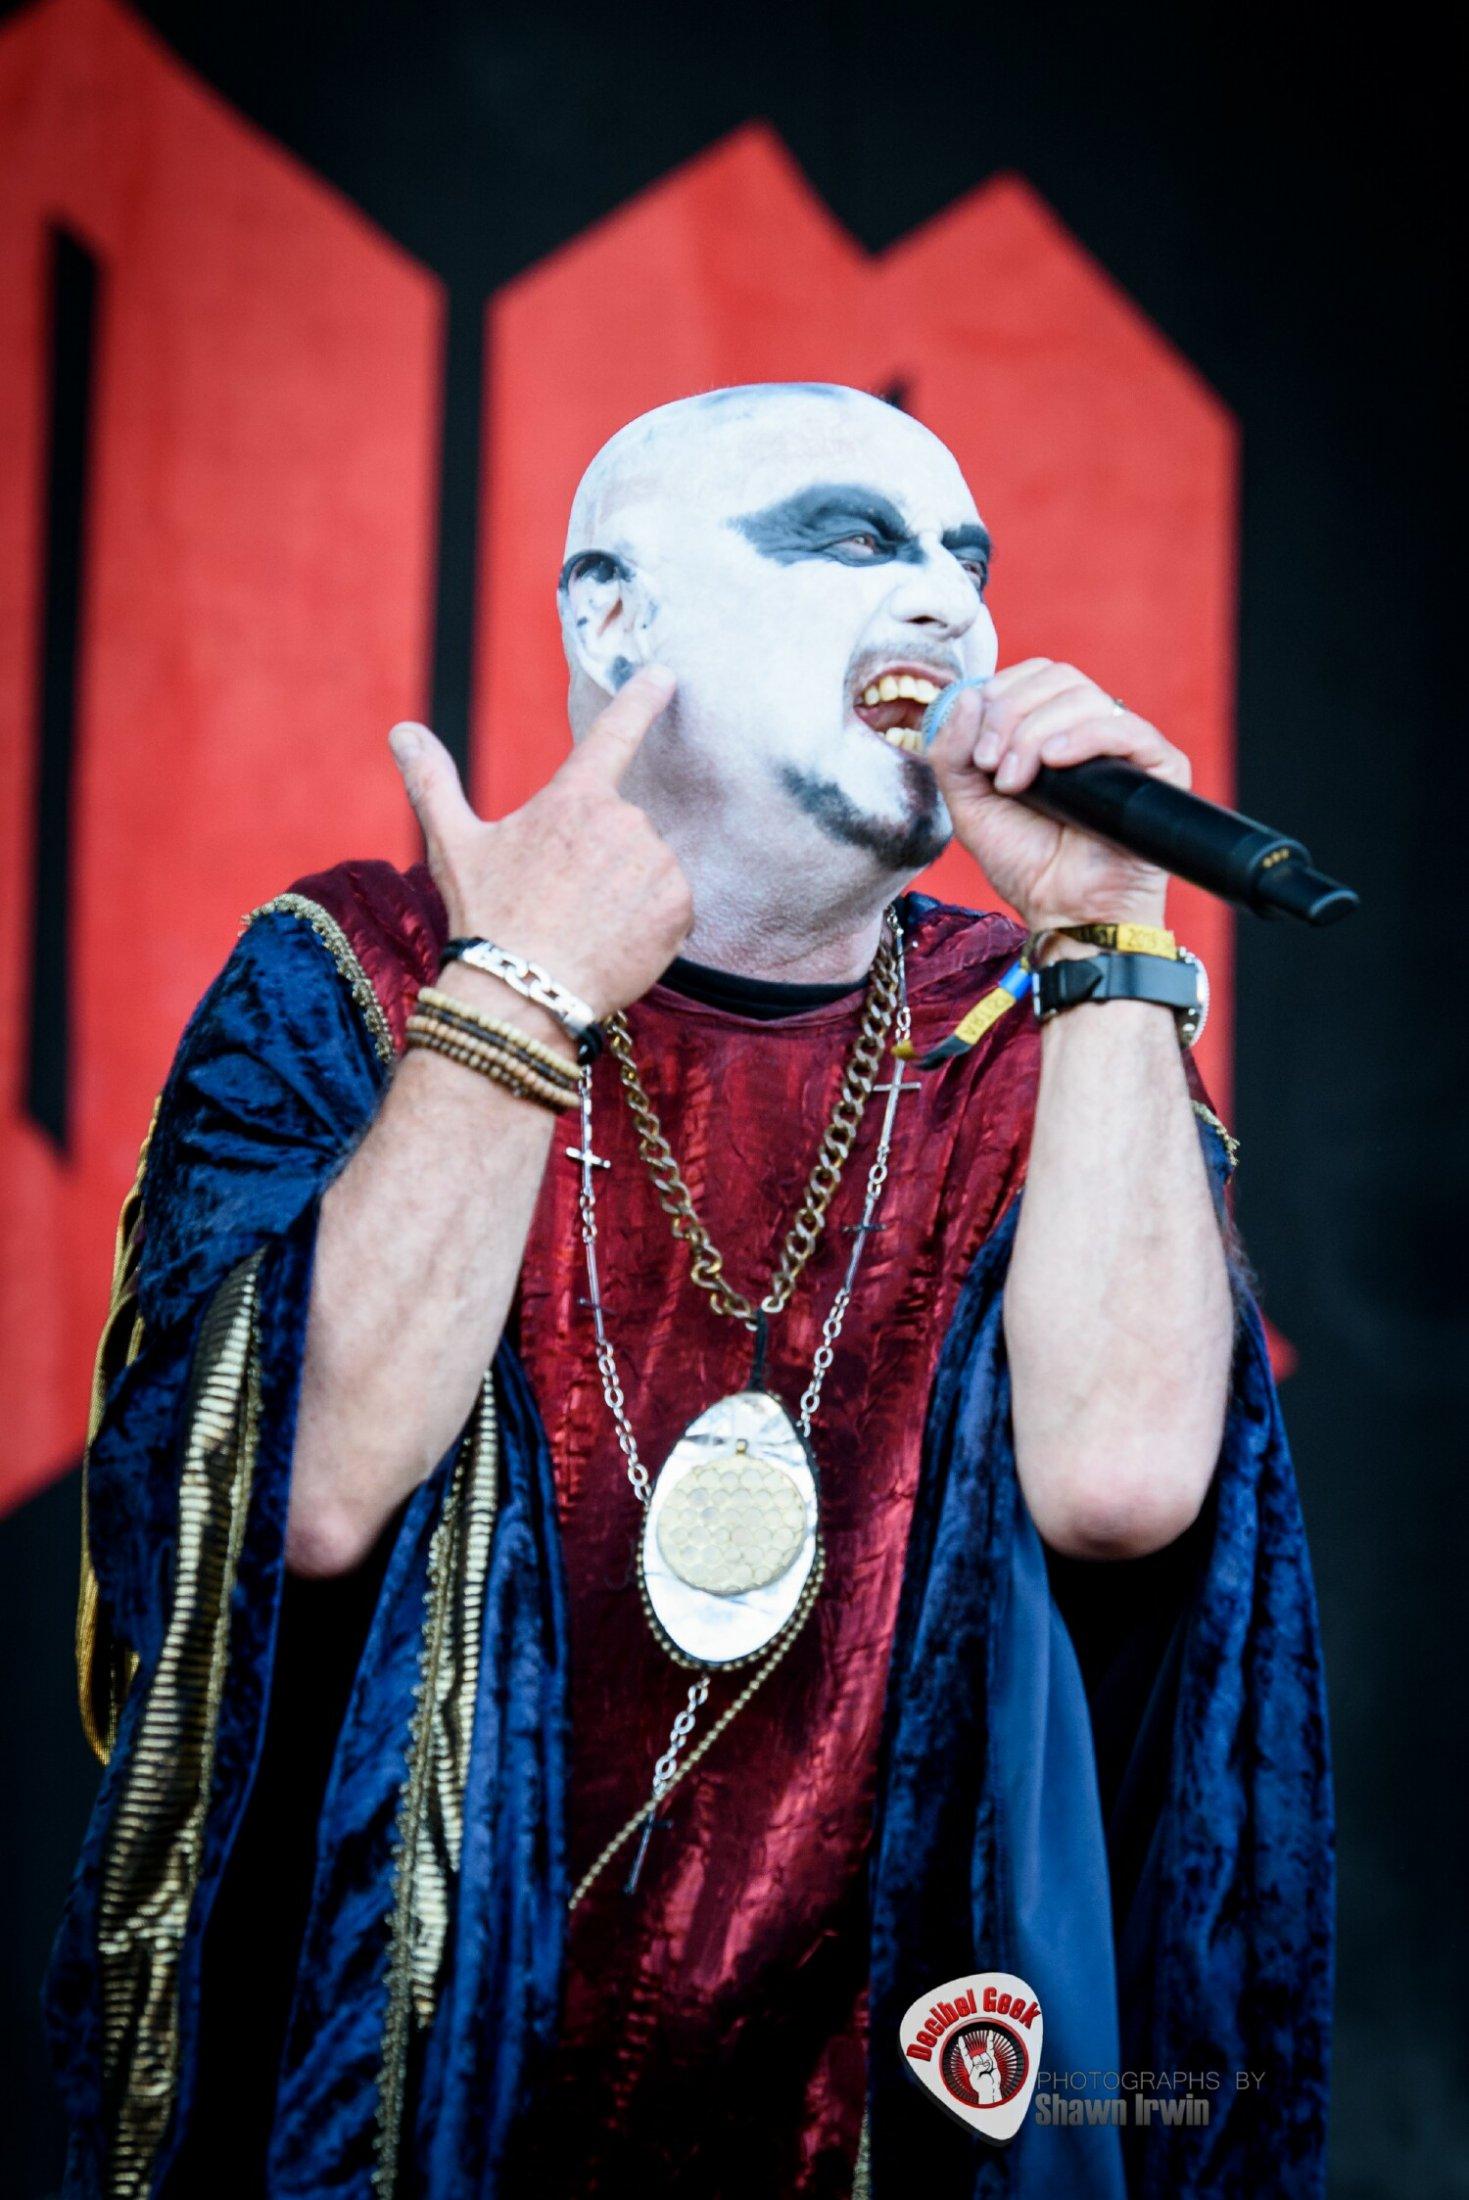 Demon #27-Sweden Rock 2019-Shawn Irwin